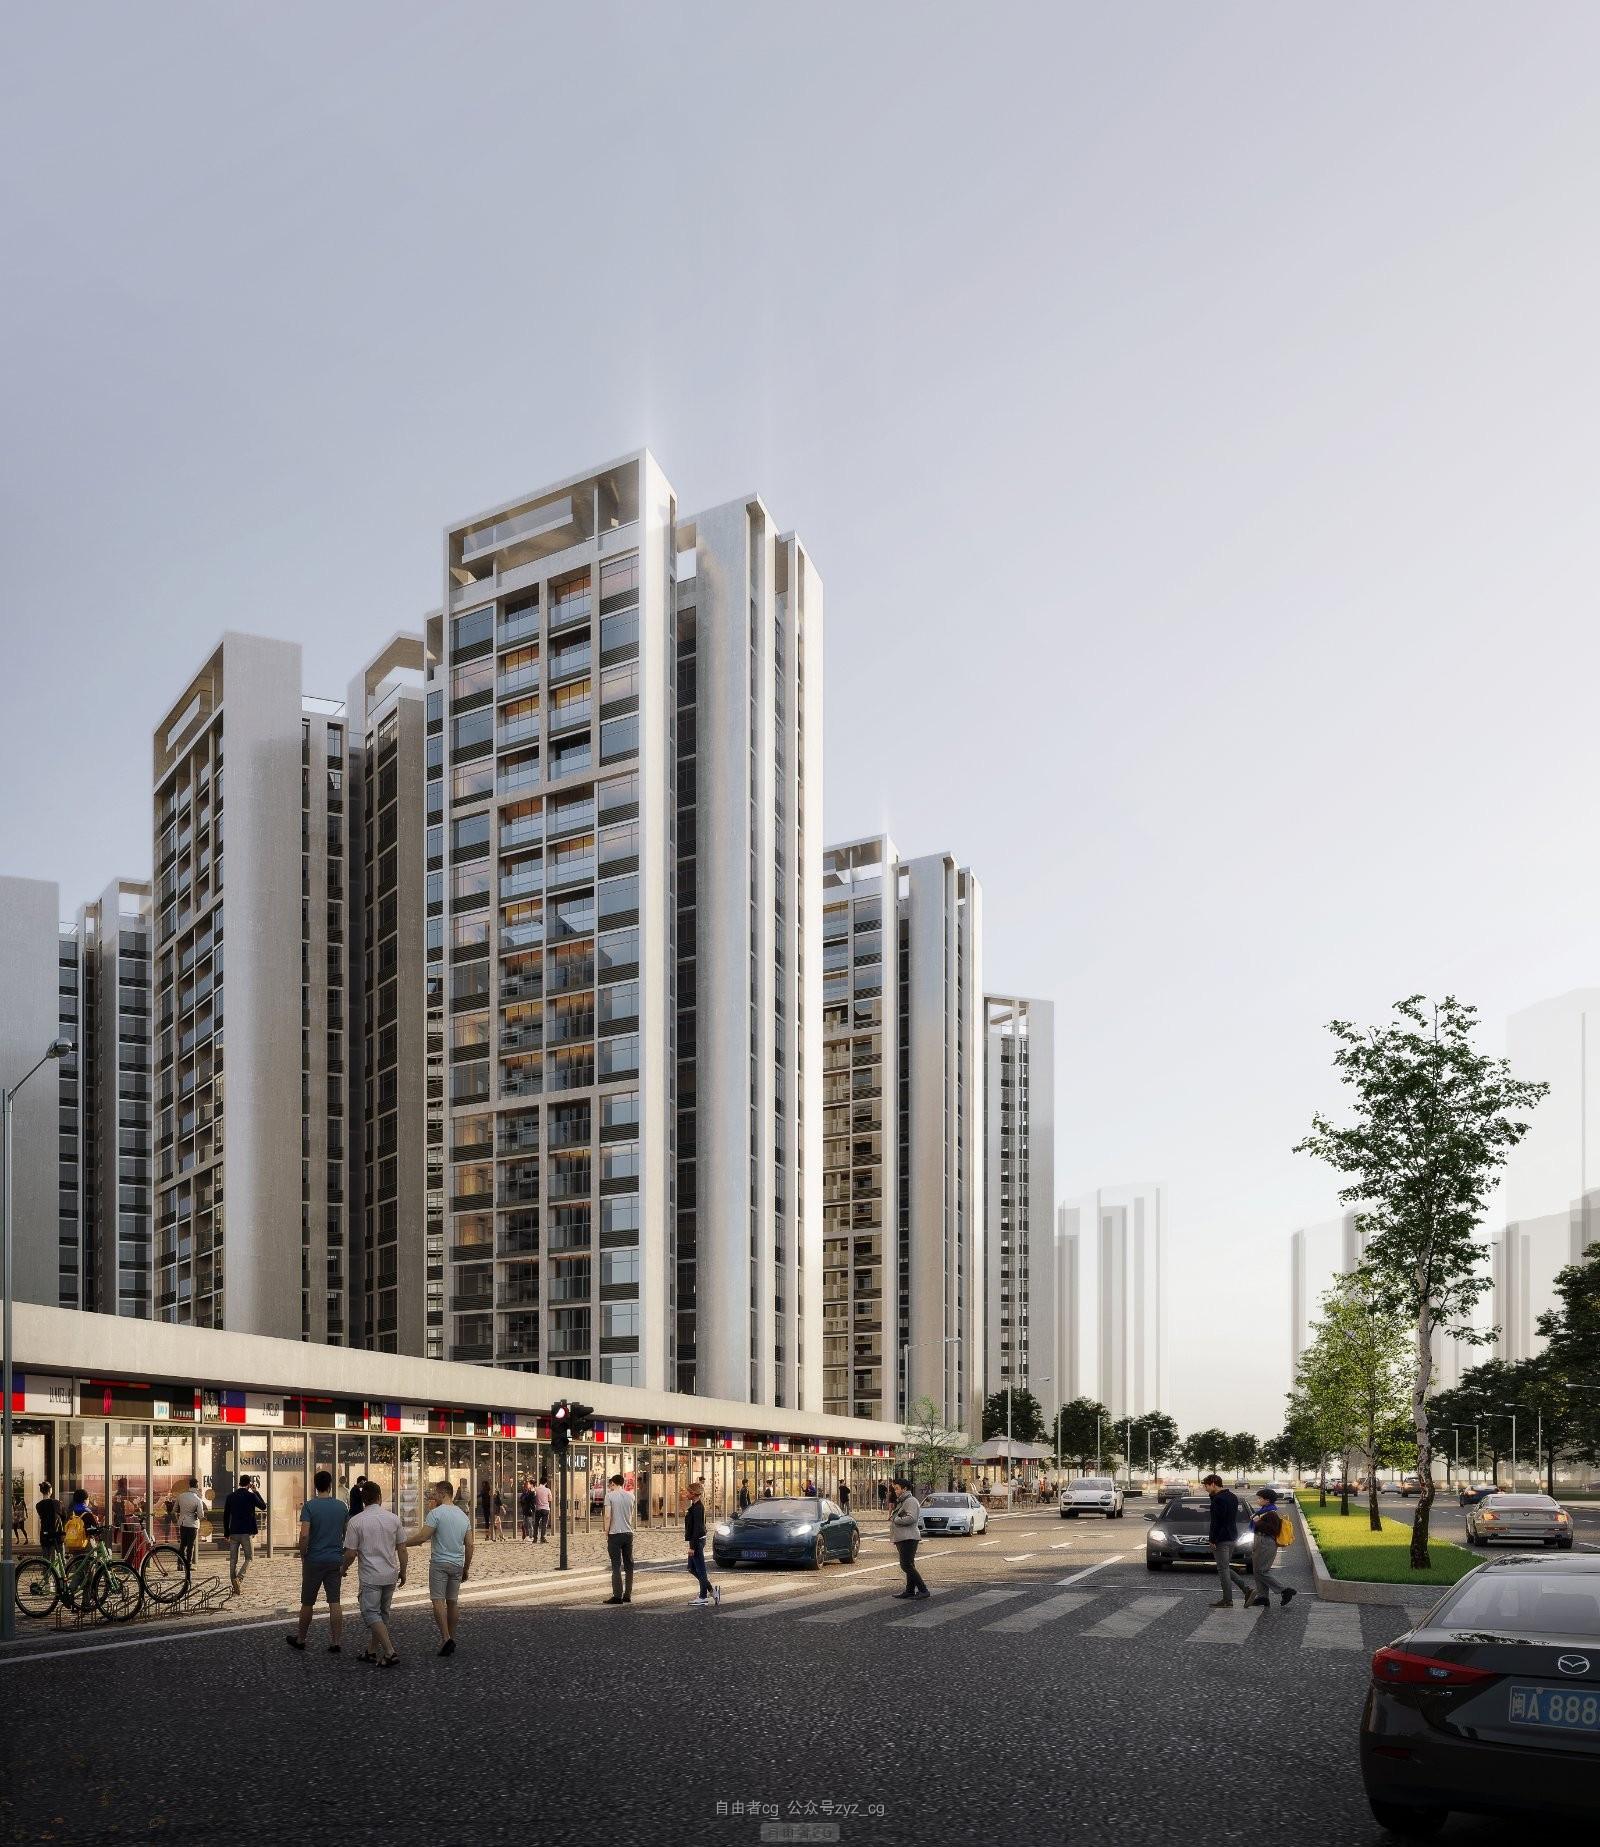 Ⅰ-W2004016A 福州住宅第一轮2020.4.7 彭俊博F3-V002-DD..jpg